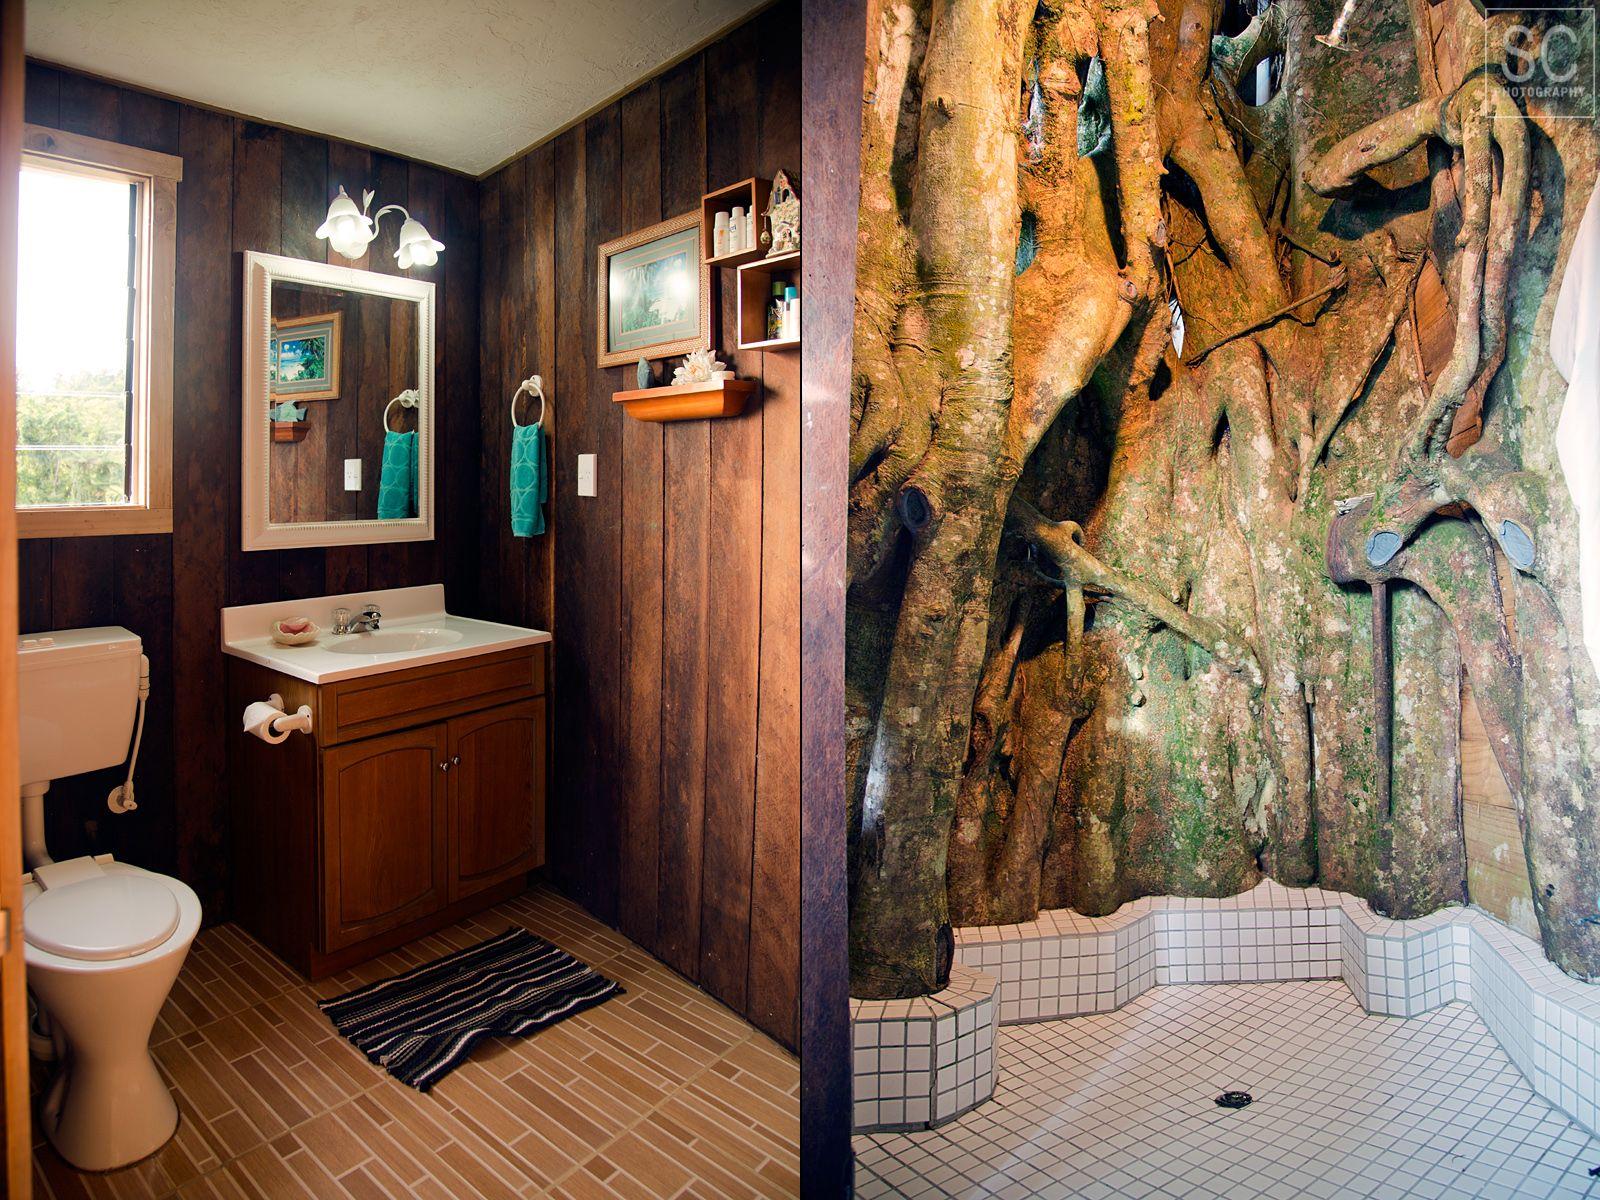 Bathroom in the treehouse lupe sina treesort lupe sina treehouses pinterest treehouse - Tree house bathroom ...